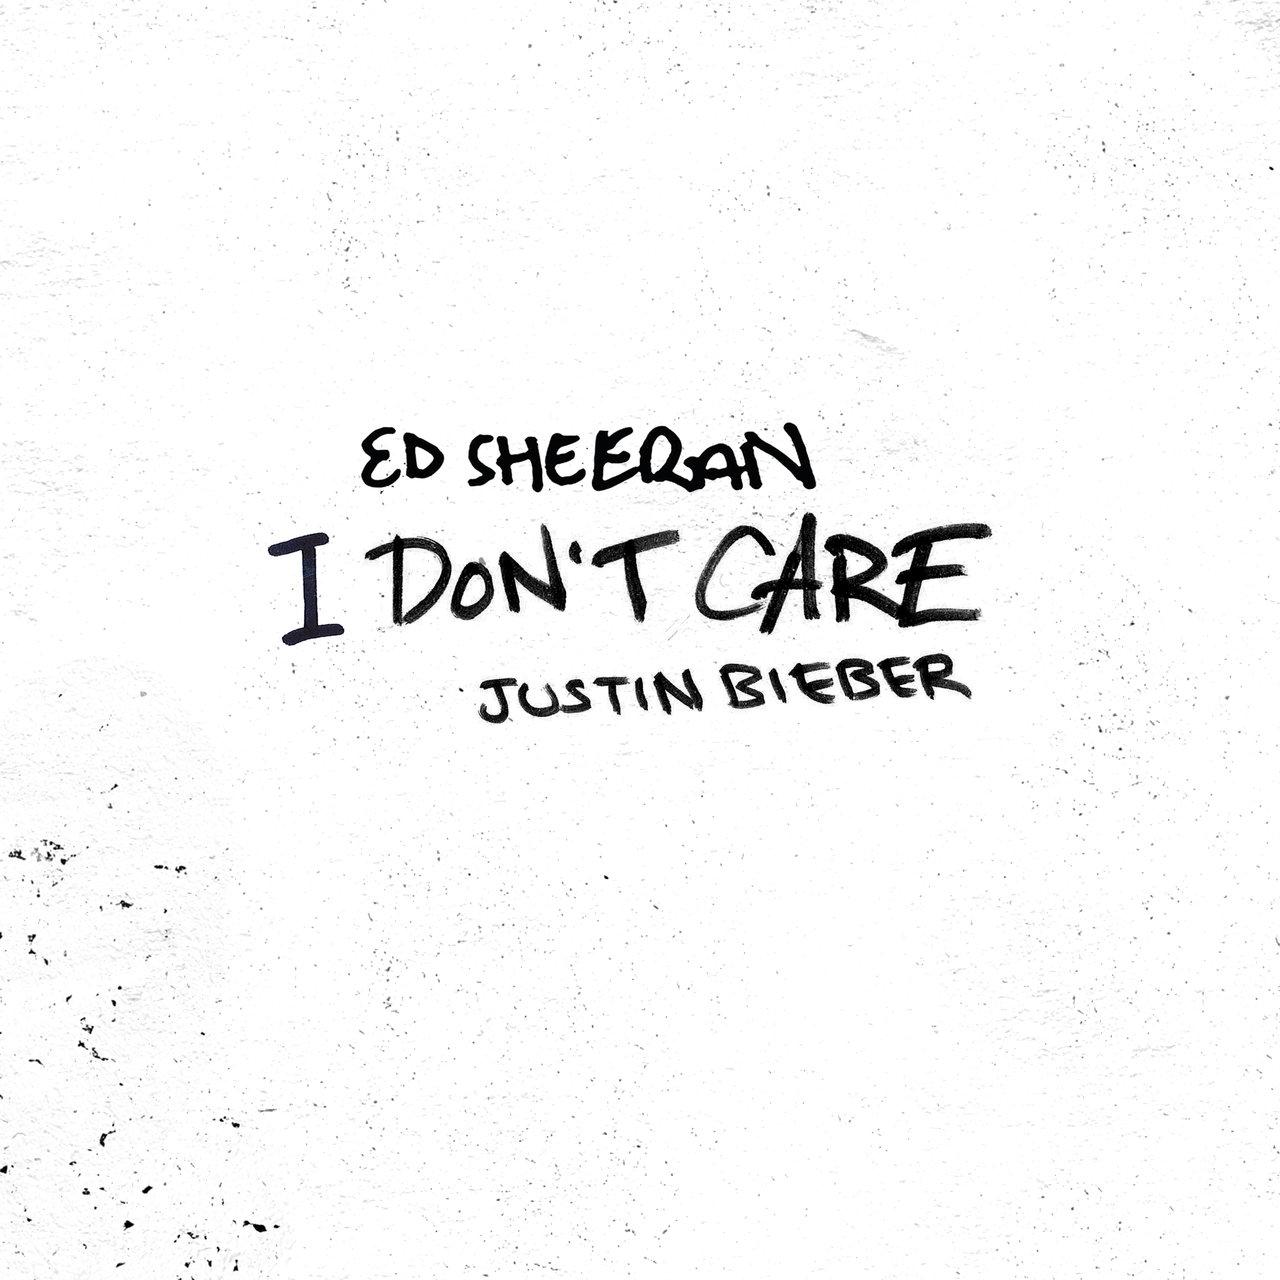 FLAC - Ed Sheeran, Justin Bieber - I Don't Care (2019) [TDL/FLAC